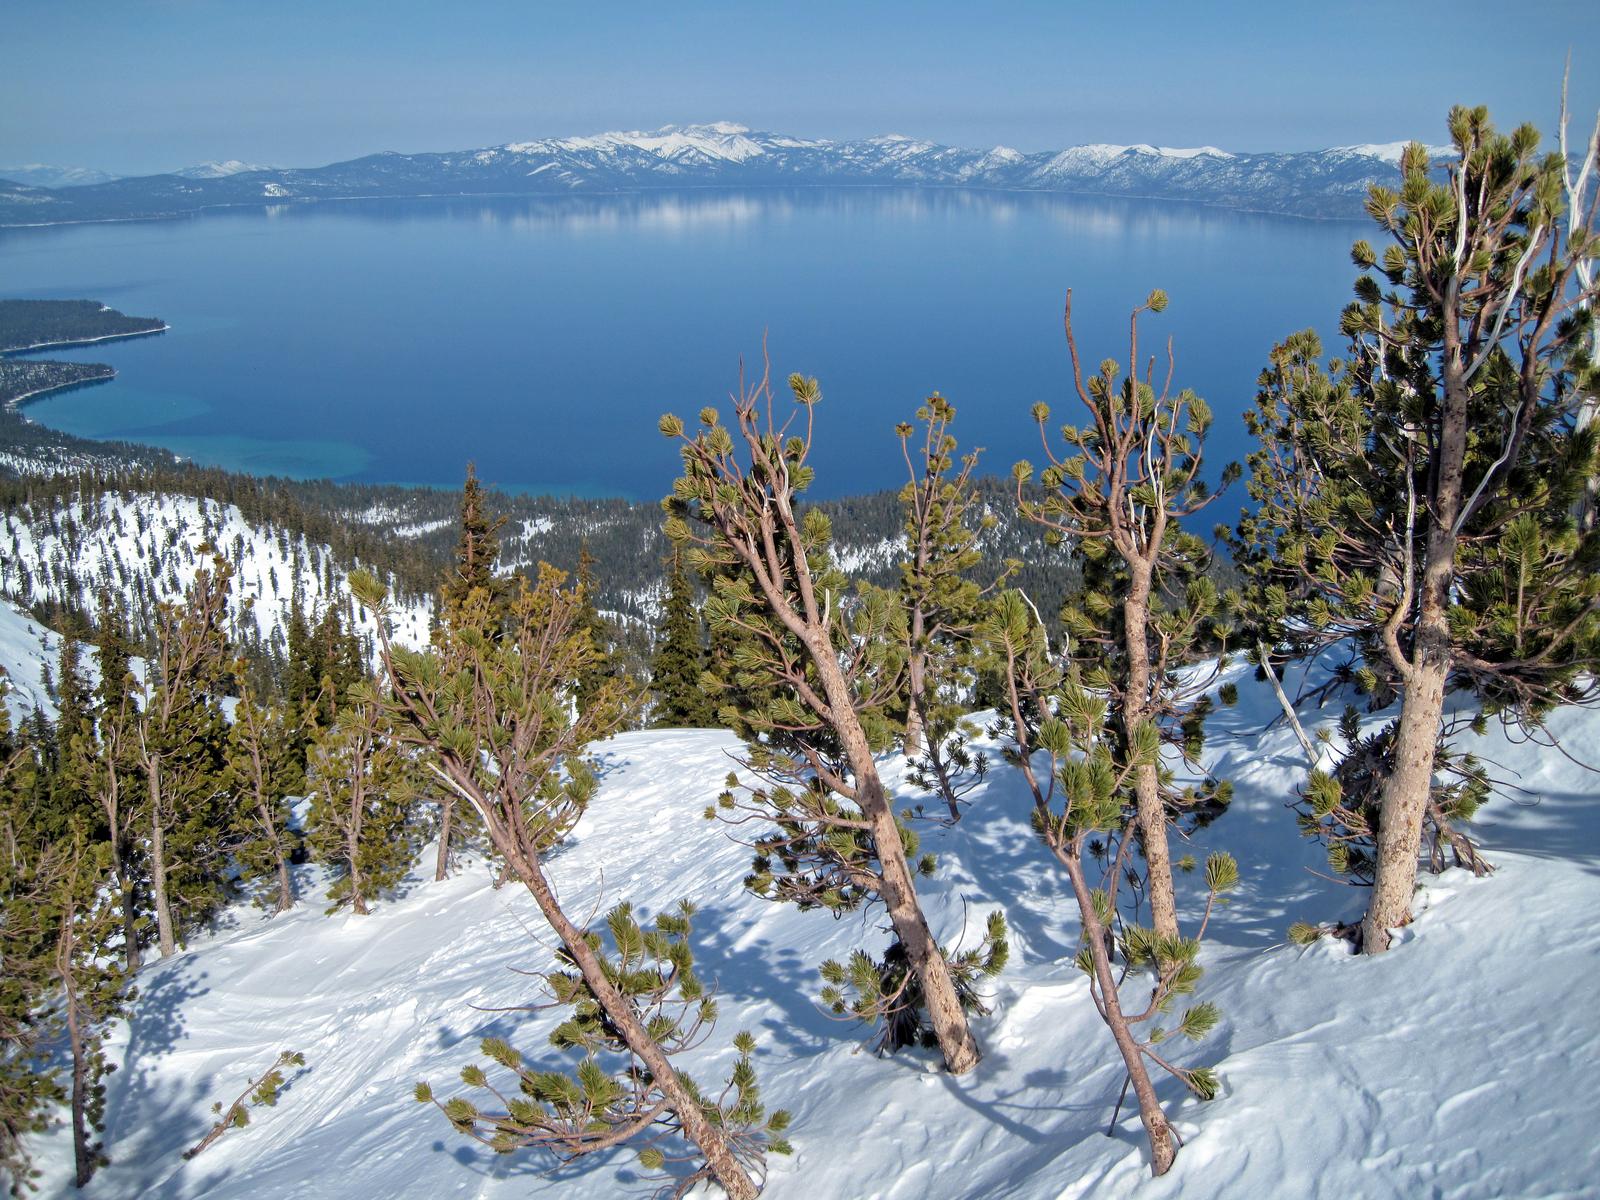 view from atop Jake's Peak, west shore Lake Tahoe